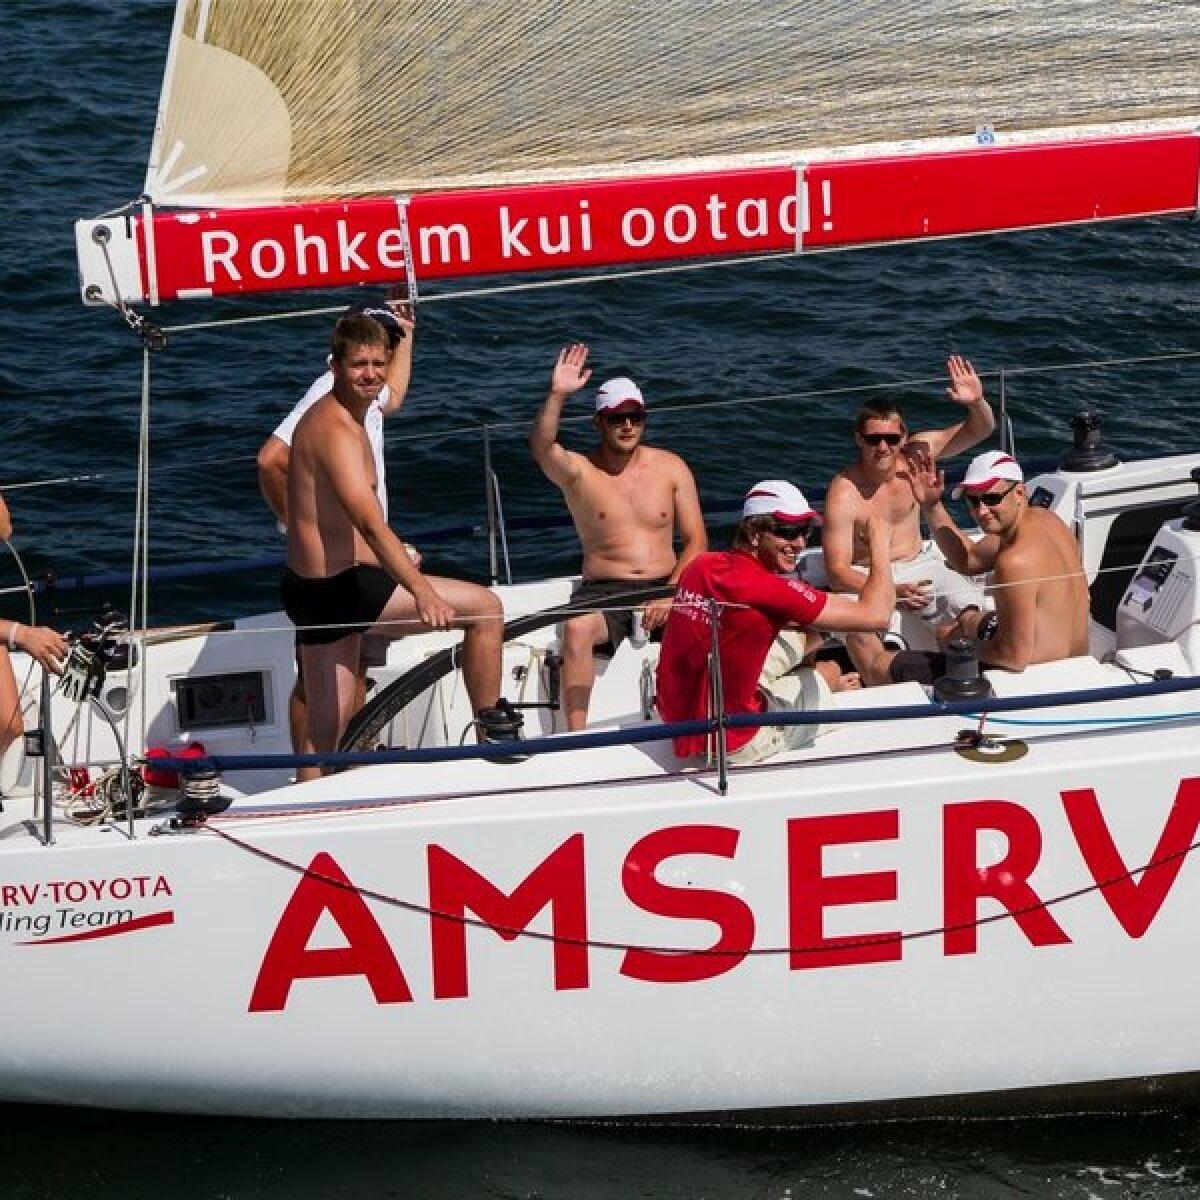 Muhu väina regati esimene start 2013